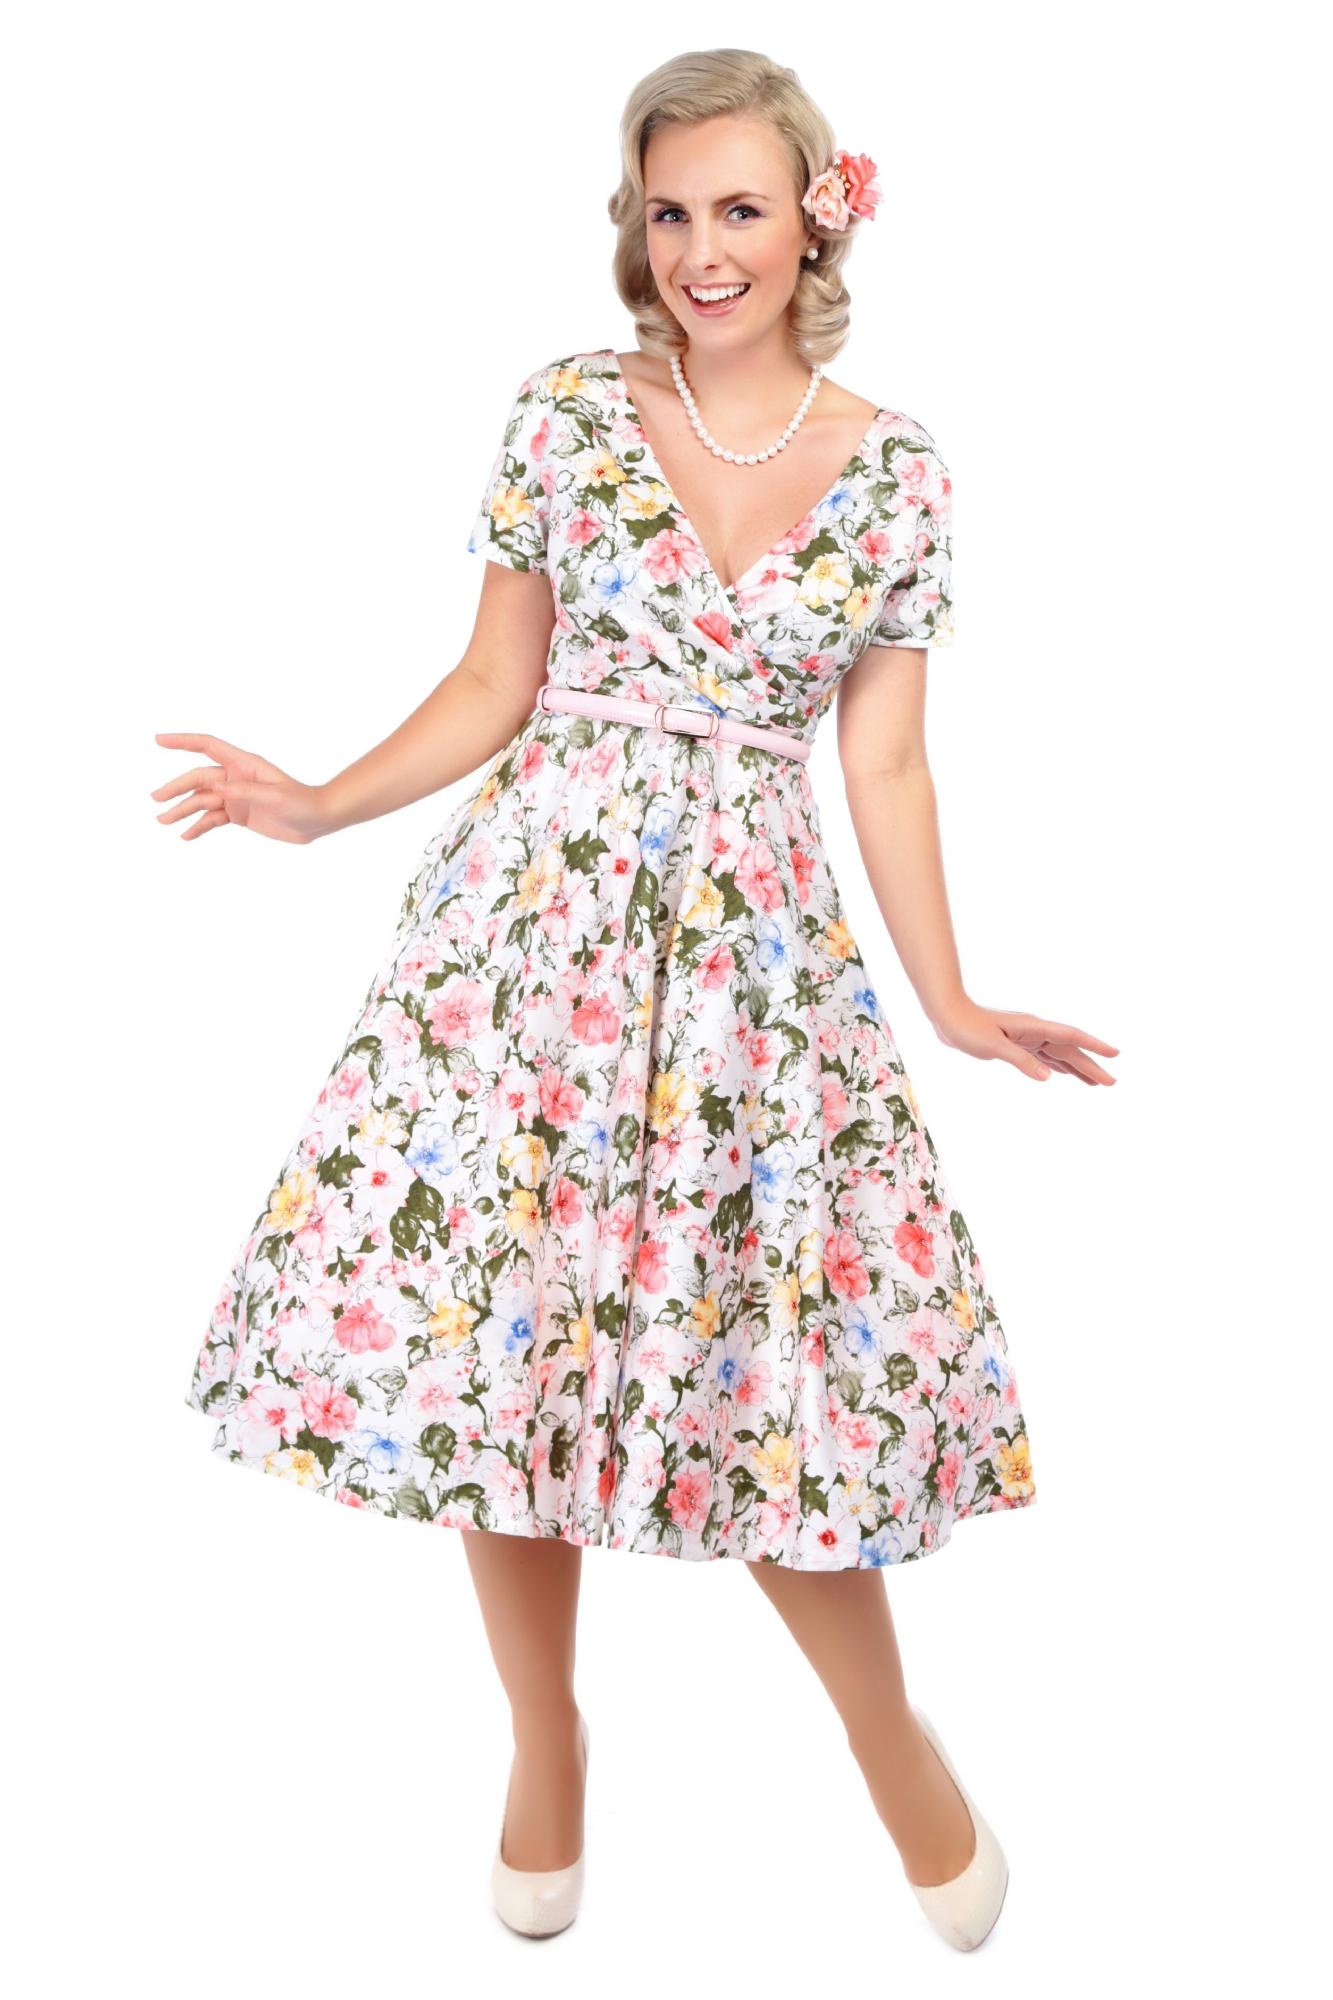 de2dd3fab015 COLLECTIF VINTAGE ARTISTIC FLORAL MARIA DRESS 8-22 FLARED 1950S | eBay